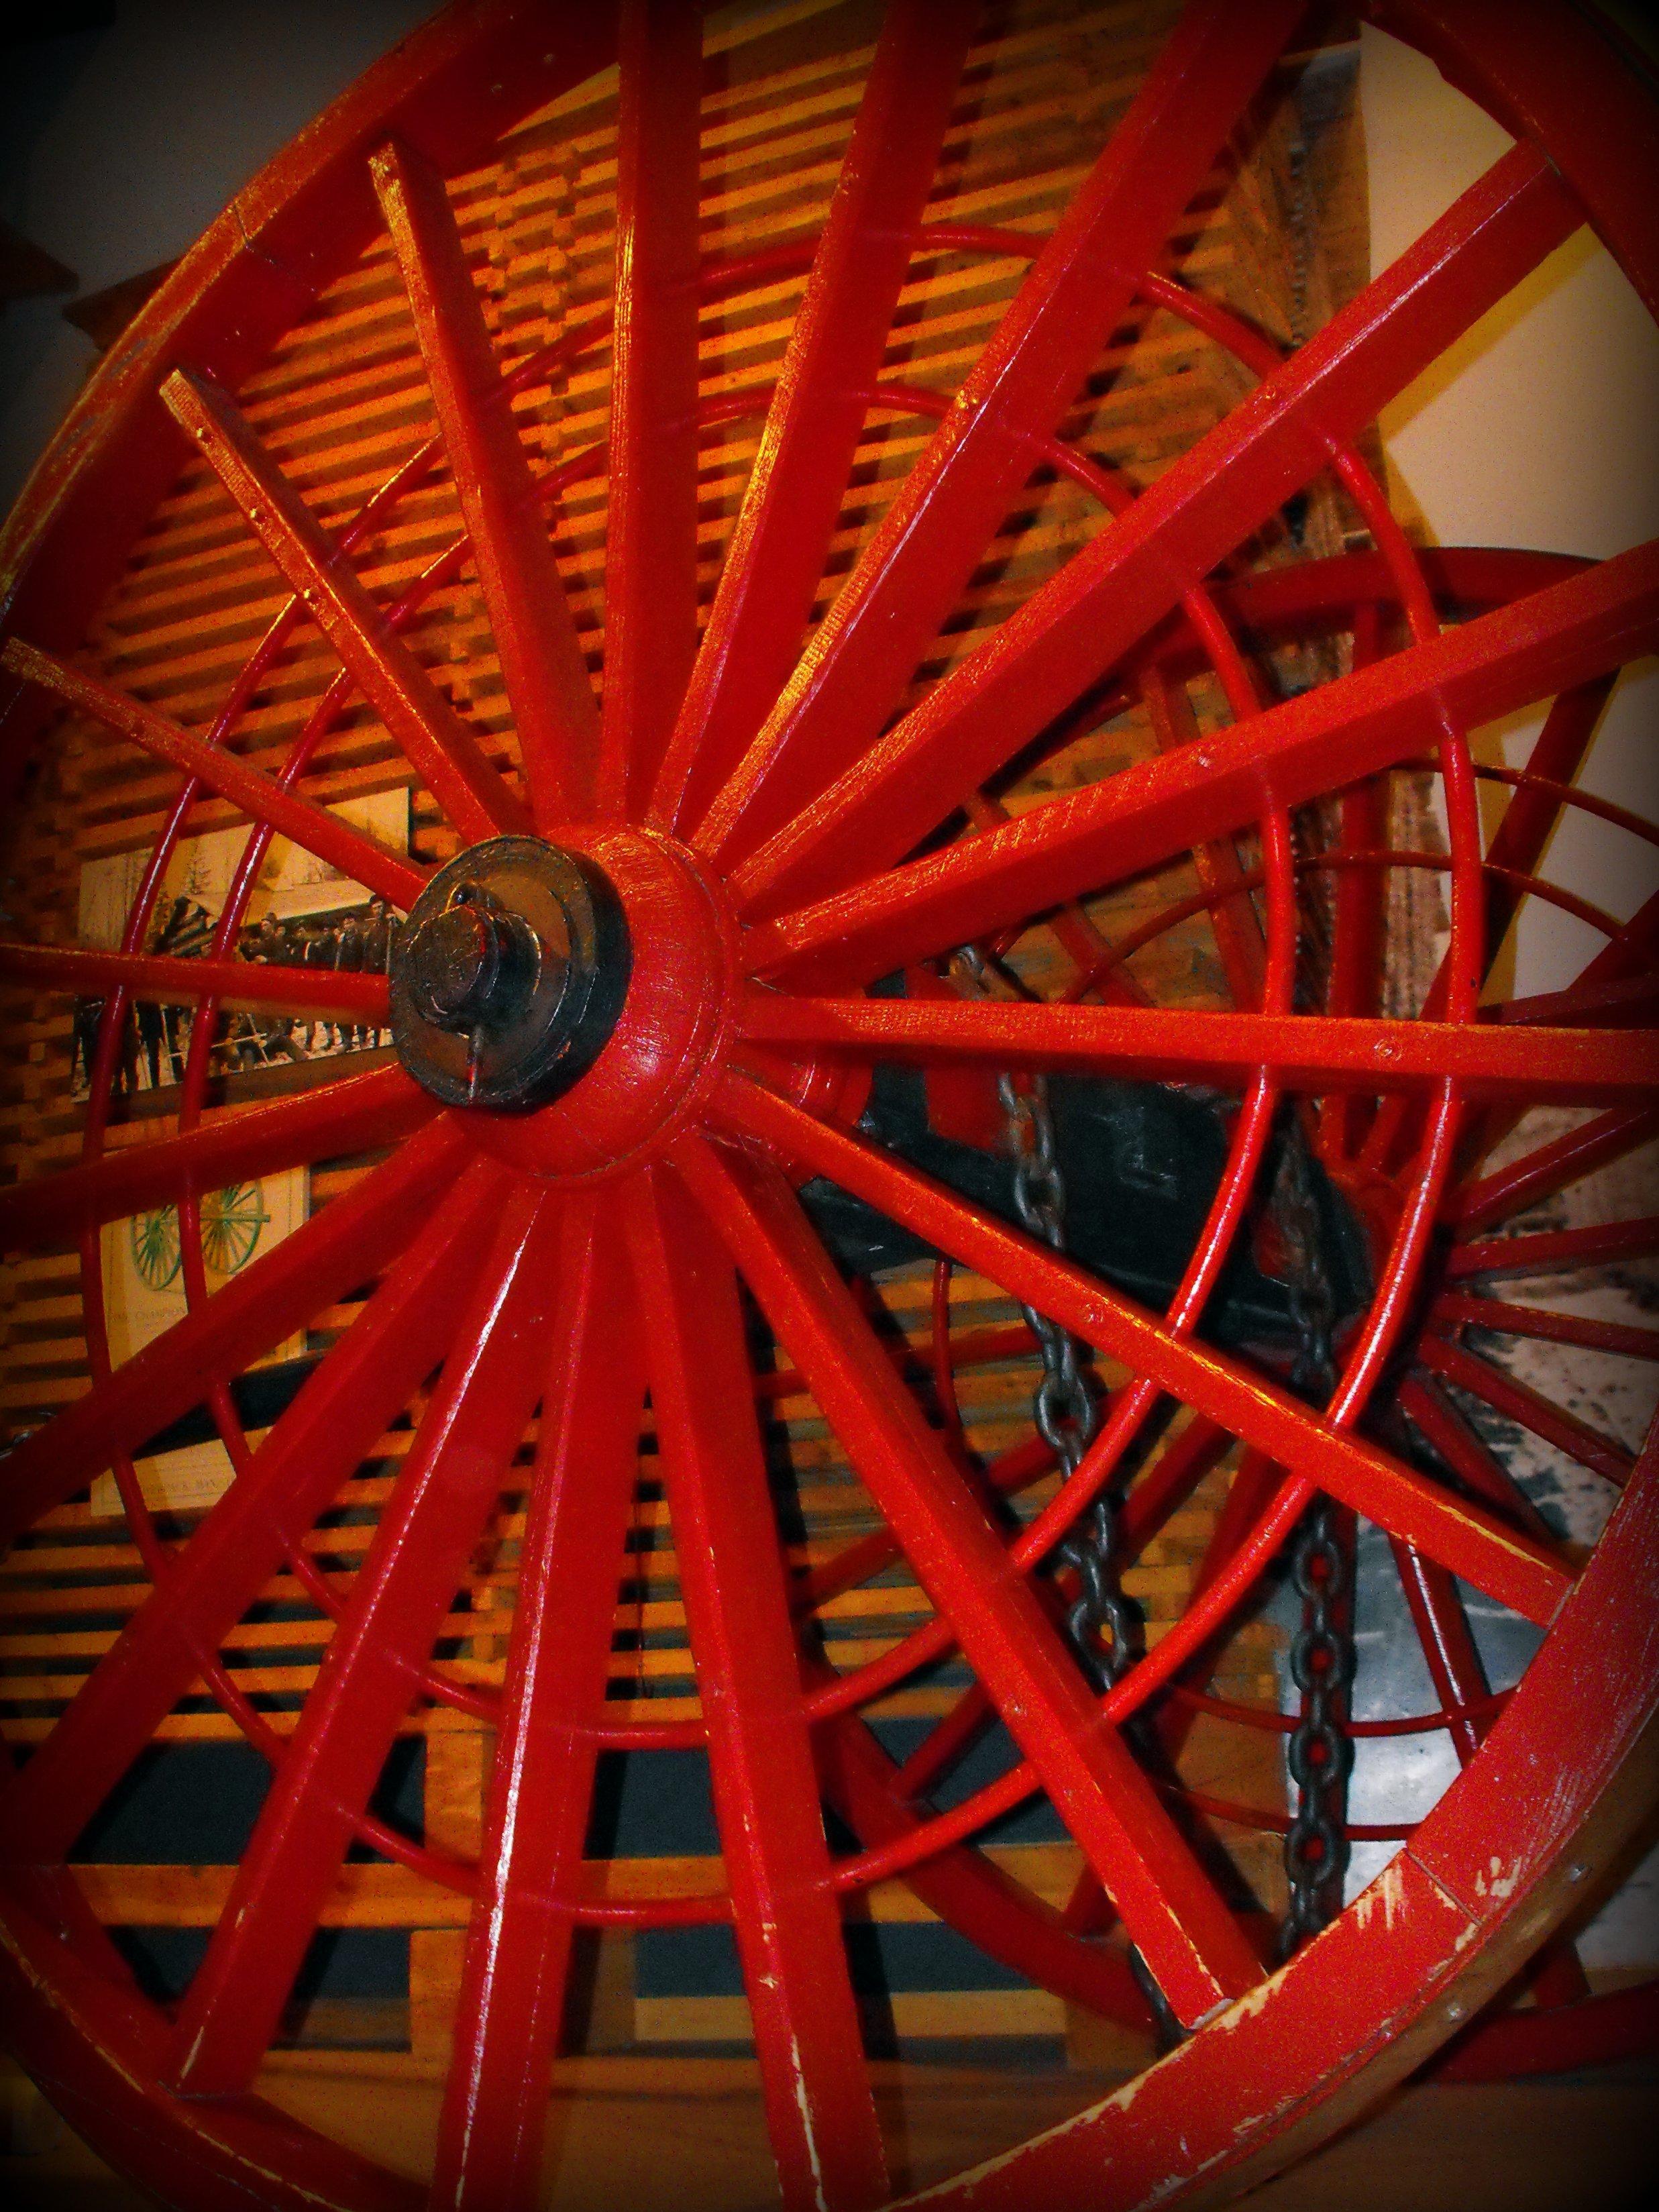 Red Wheel Weiser Online Bookstore: File:Red Logging Wagon Wheel.jpg